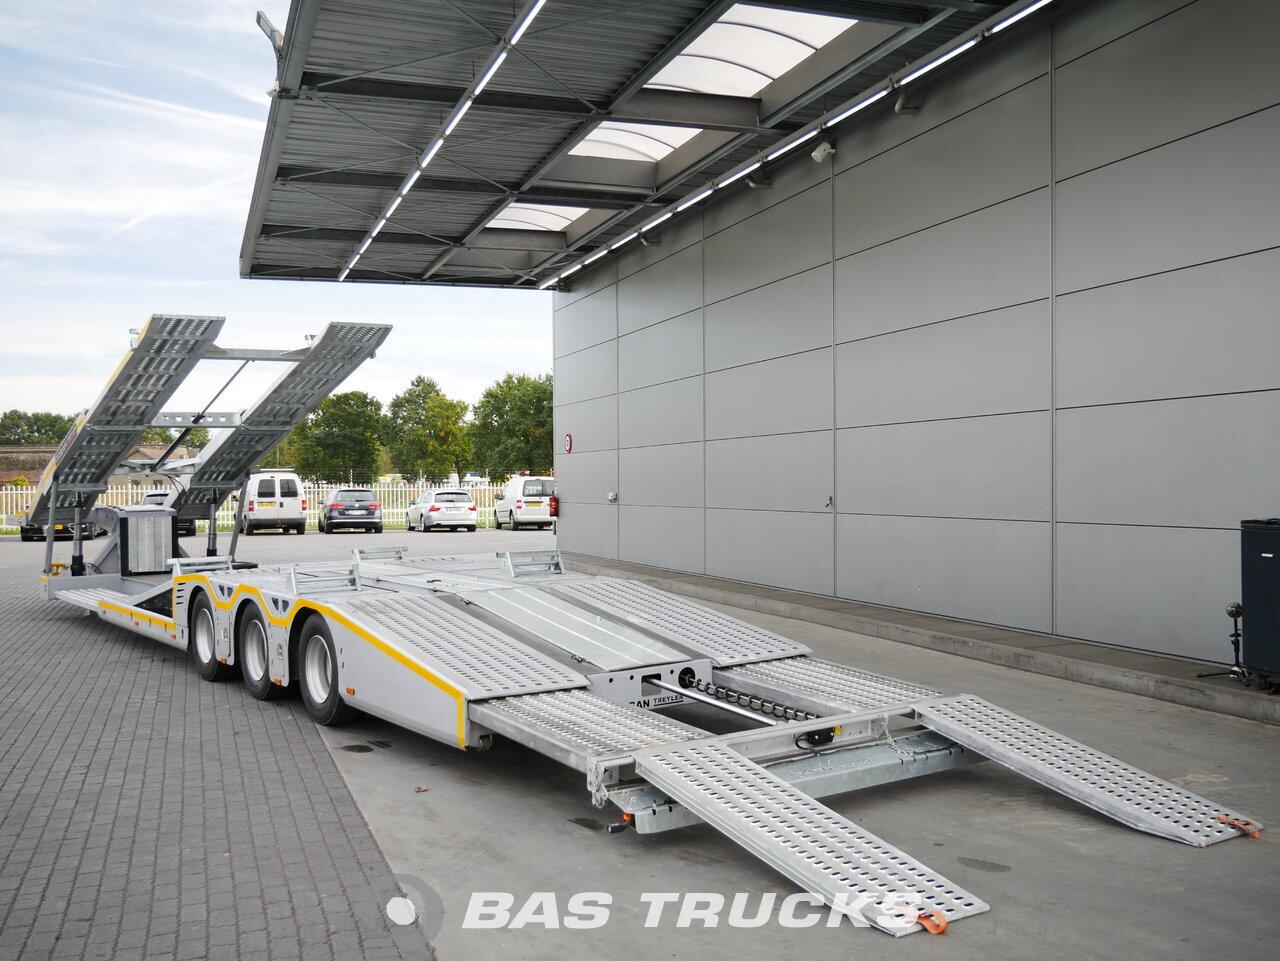 foto de Nuevo Semirremolque Ozsan Trucktransport SAF-achsen Ausziehbar WABCO OZS-KT3 Ejes